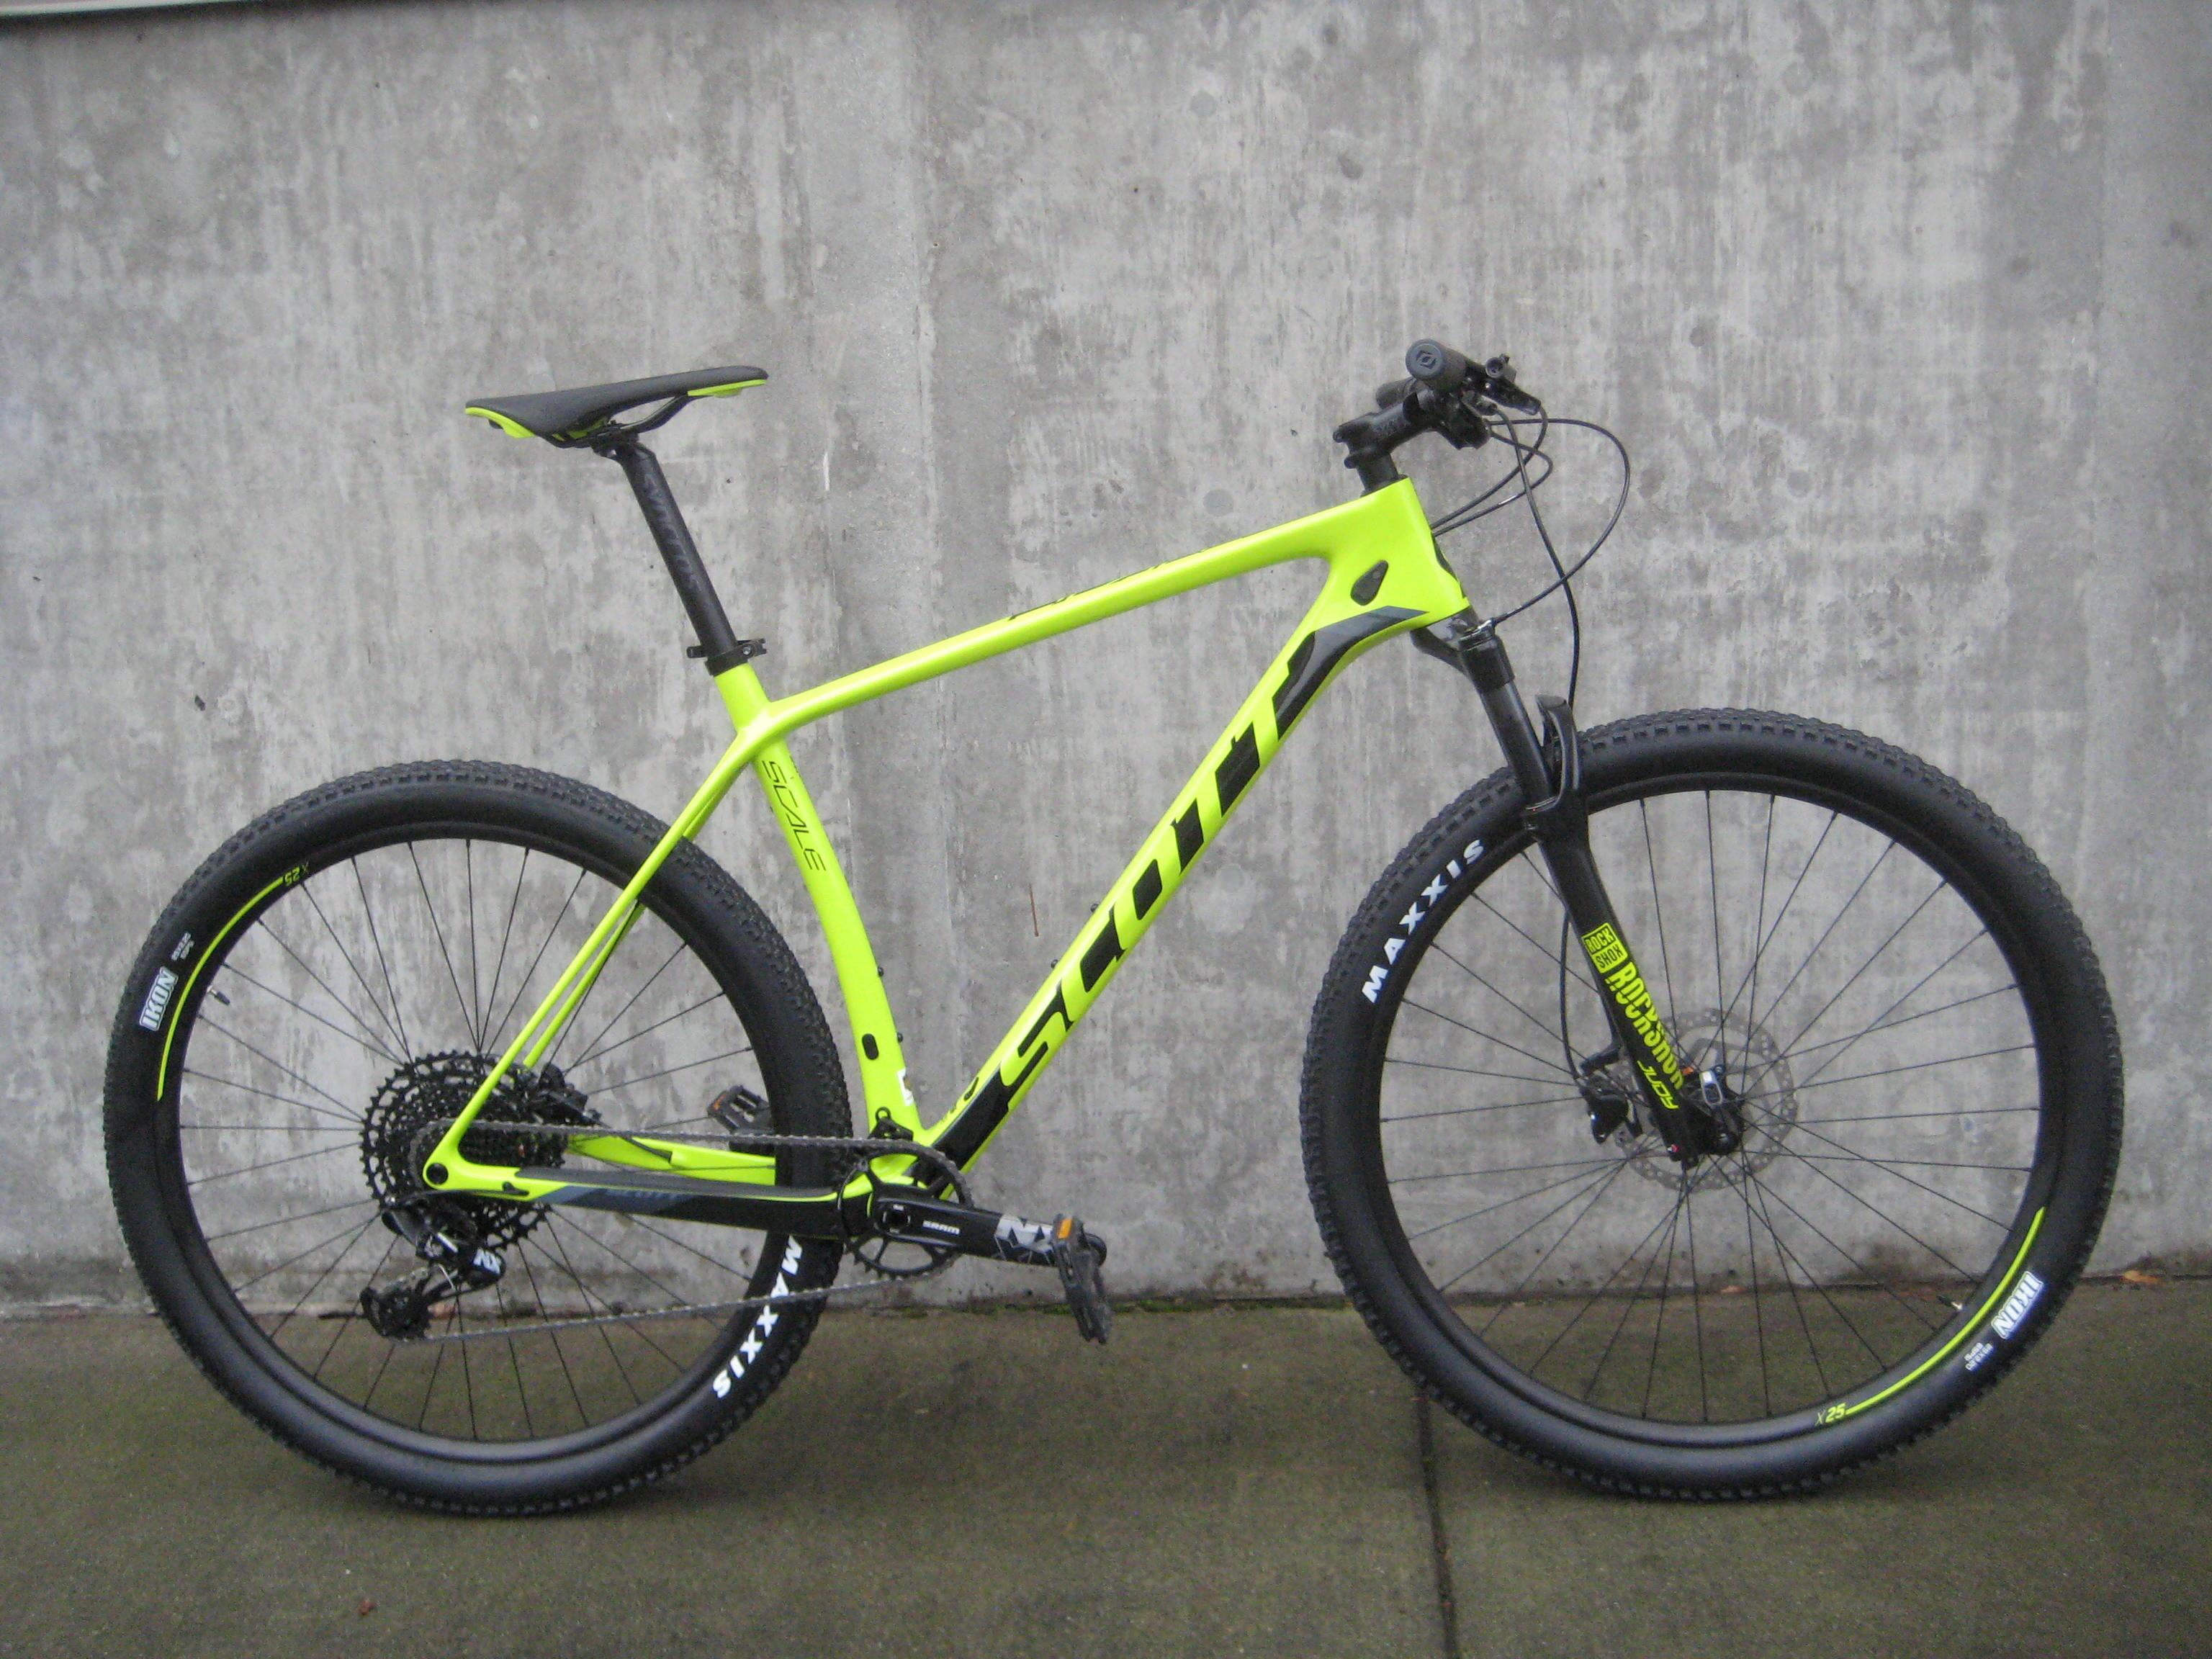 518104a3a18 Scott mountain bikes at Classic Cycle Bainbridge Island   Classic ...